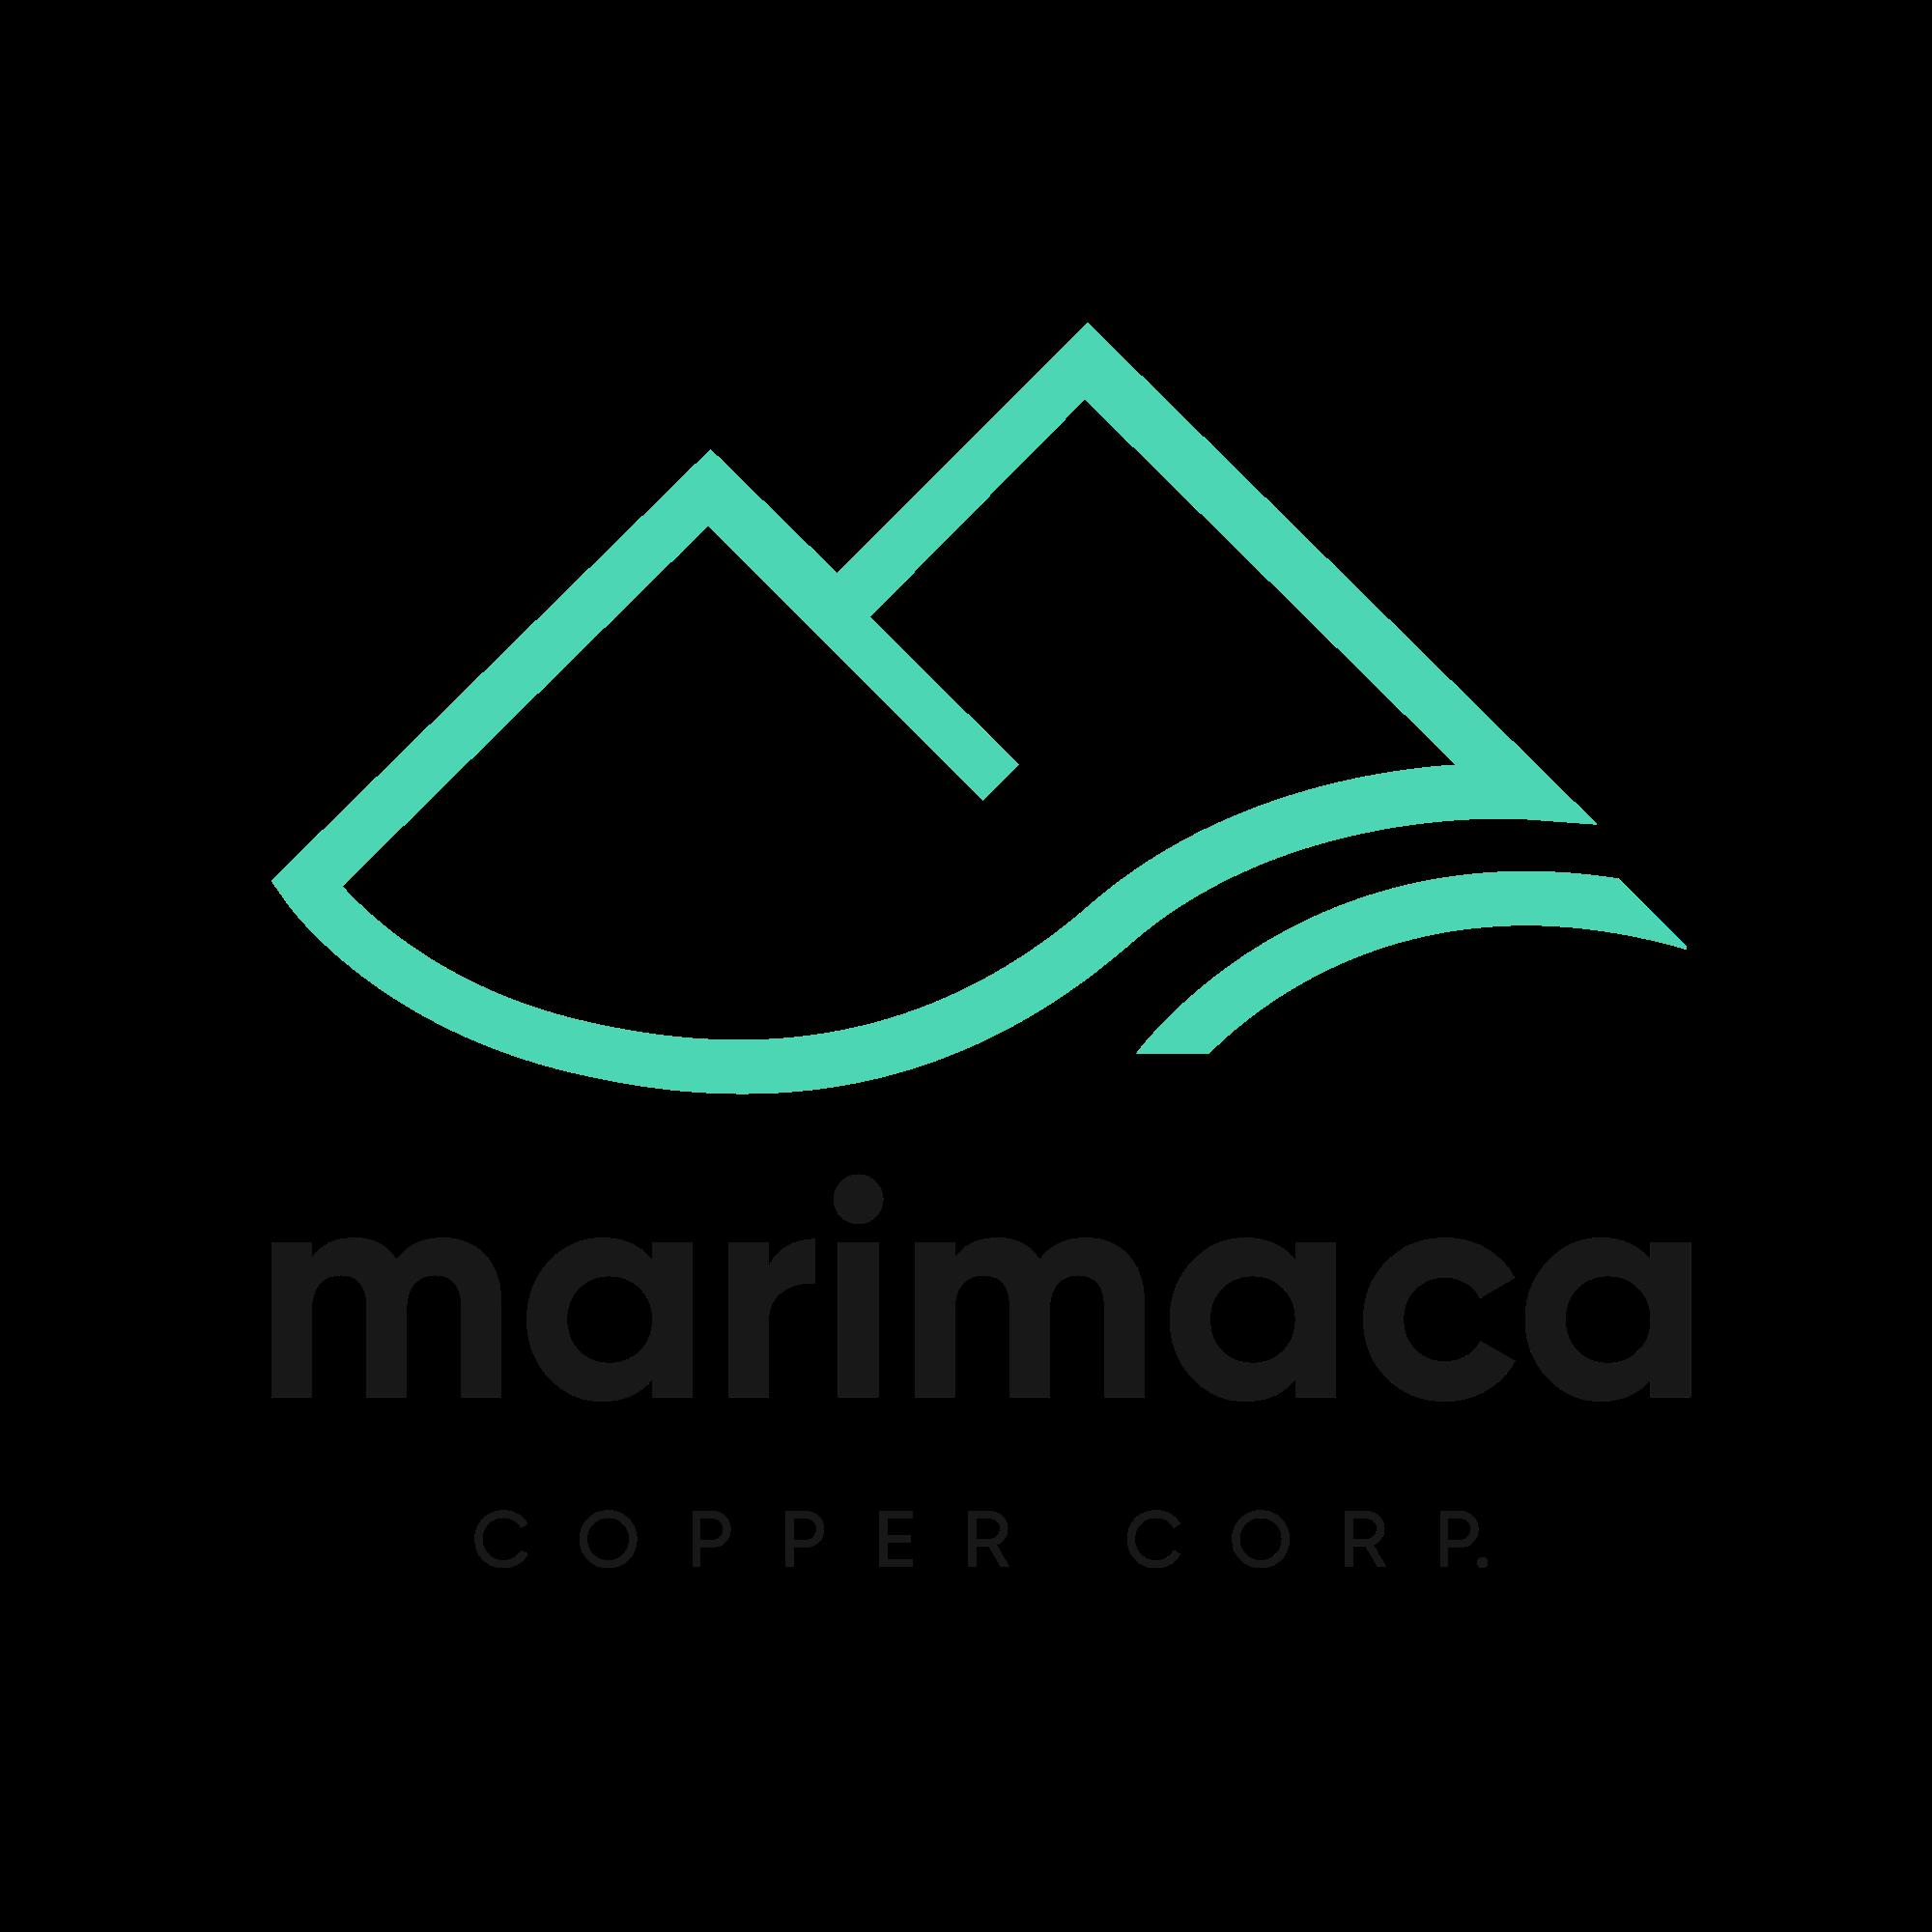 Marimaca Copper Corp